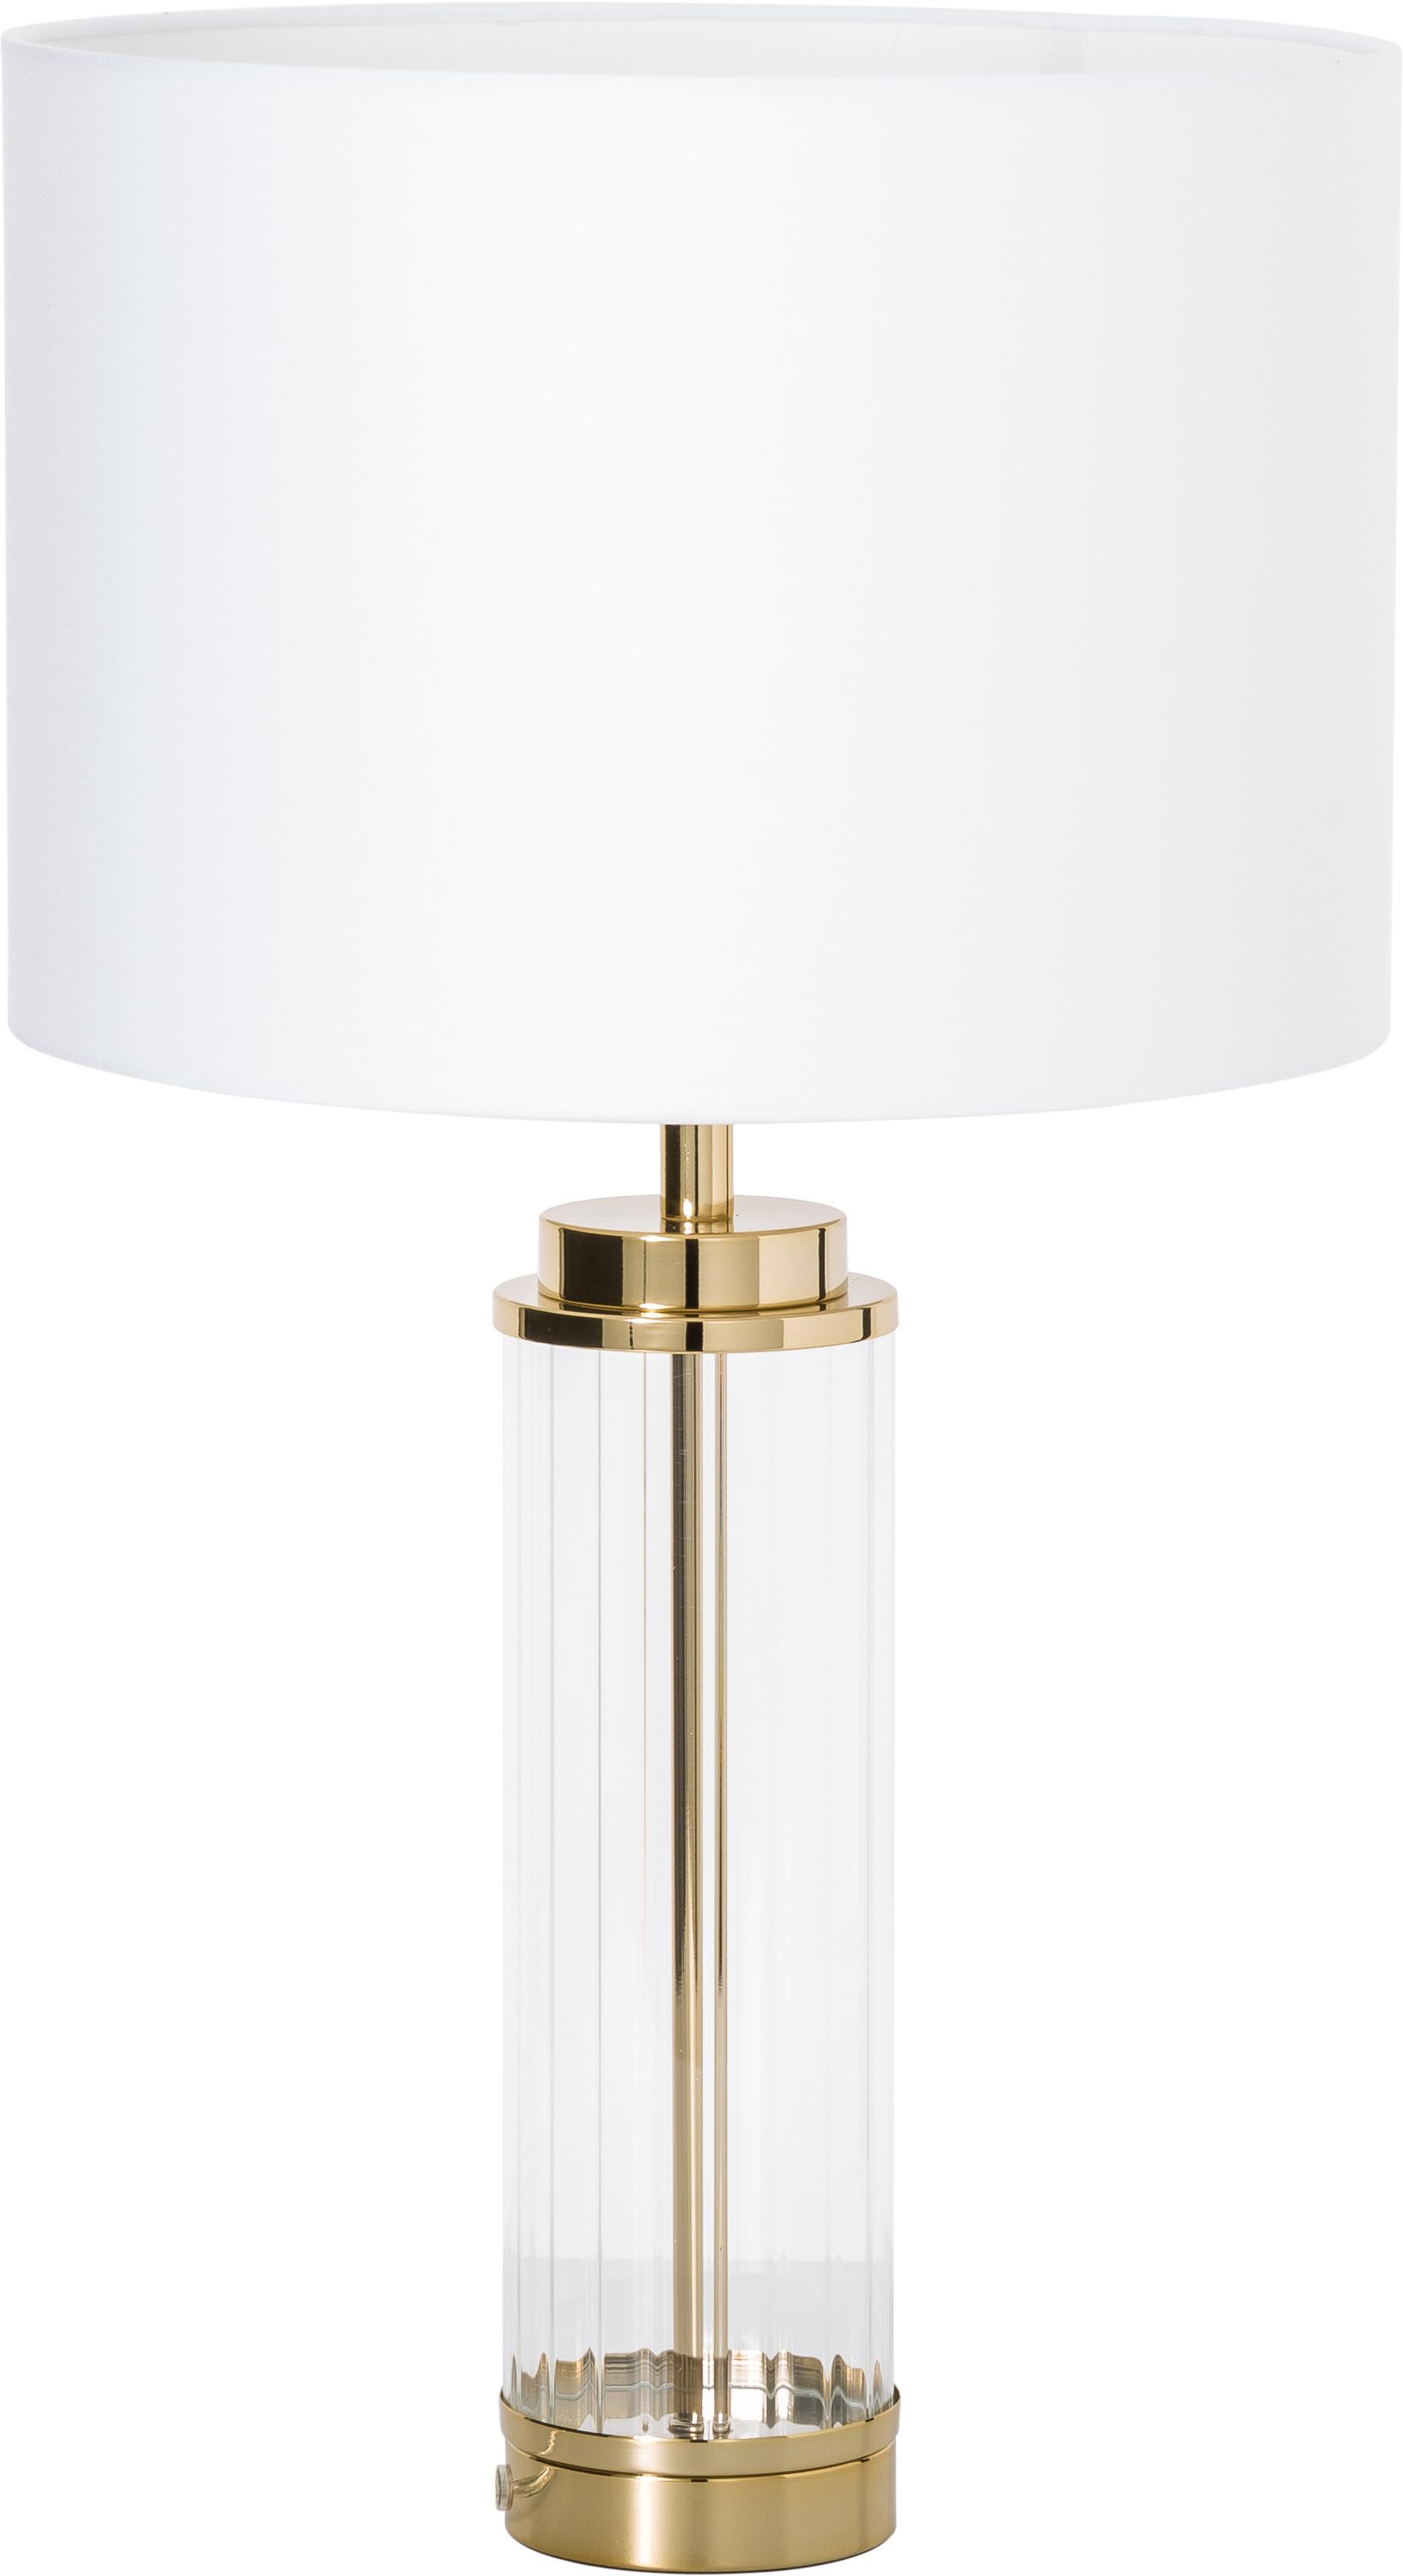 Tafellamp Gabor, Lampenkap: textiel, Lampvoet: metaal, glas, Lampenkap: crèmekleurig. Lampvoet: goudkleurig, Ø 35 x H 64 cm